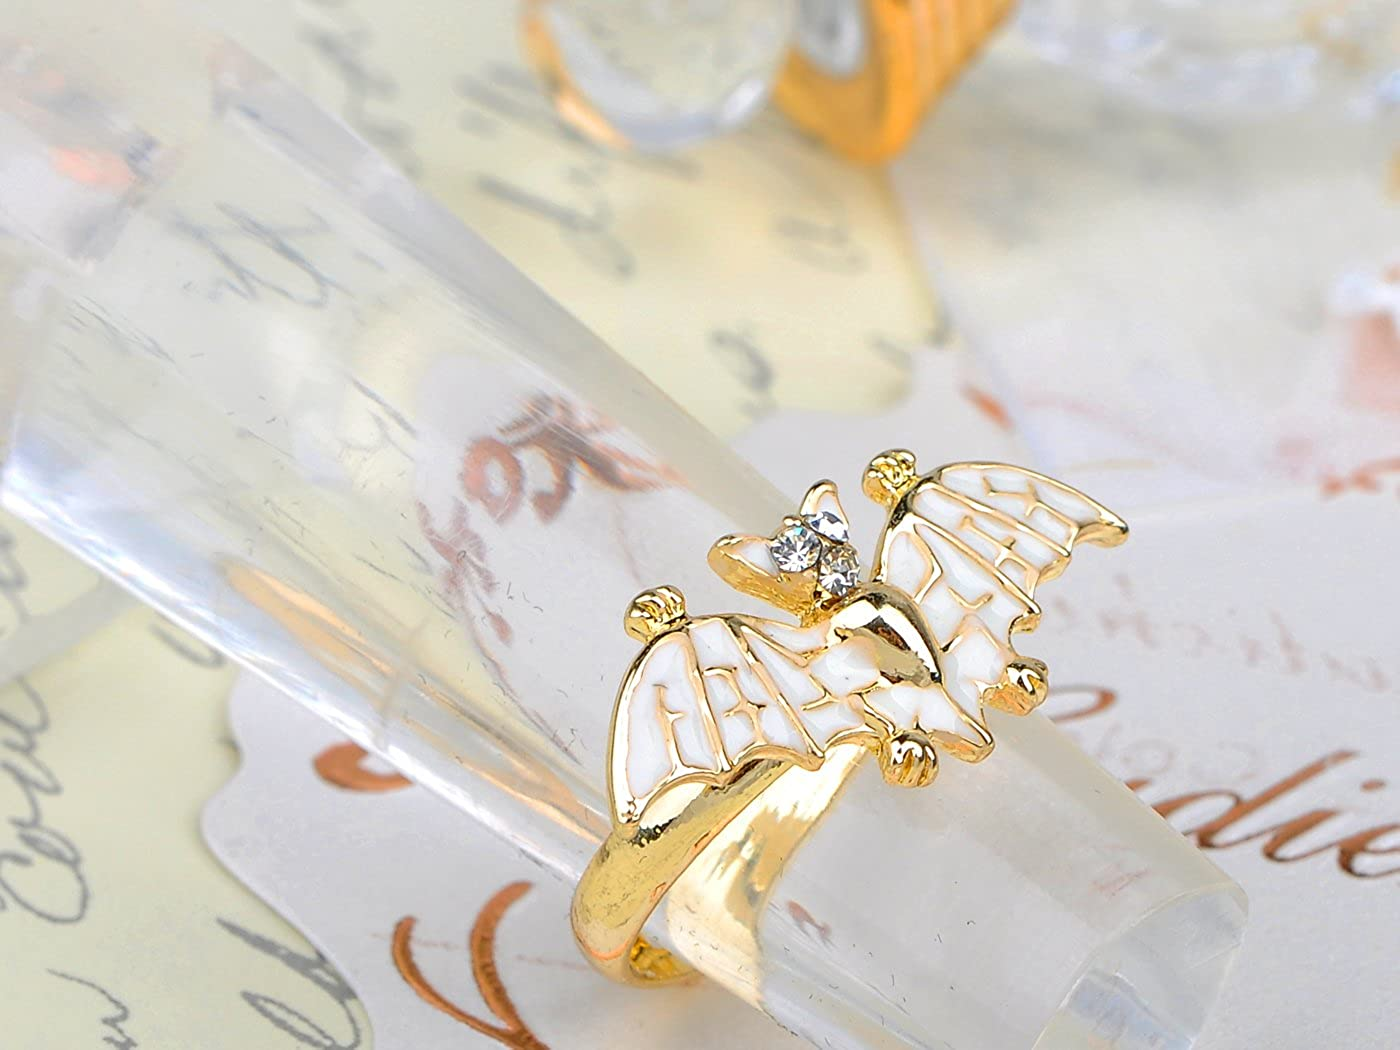 Alilang Golden Tone Petite Enamel Hand painted Flying Bat Night Creature Ring